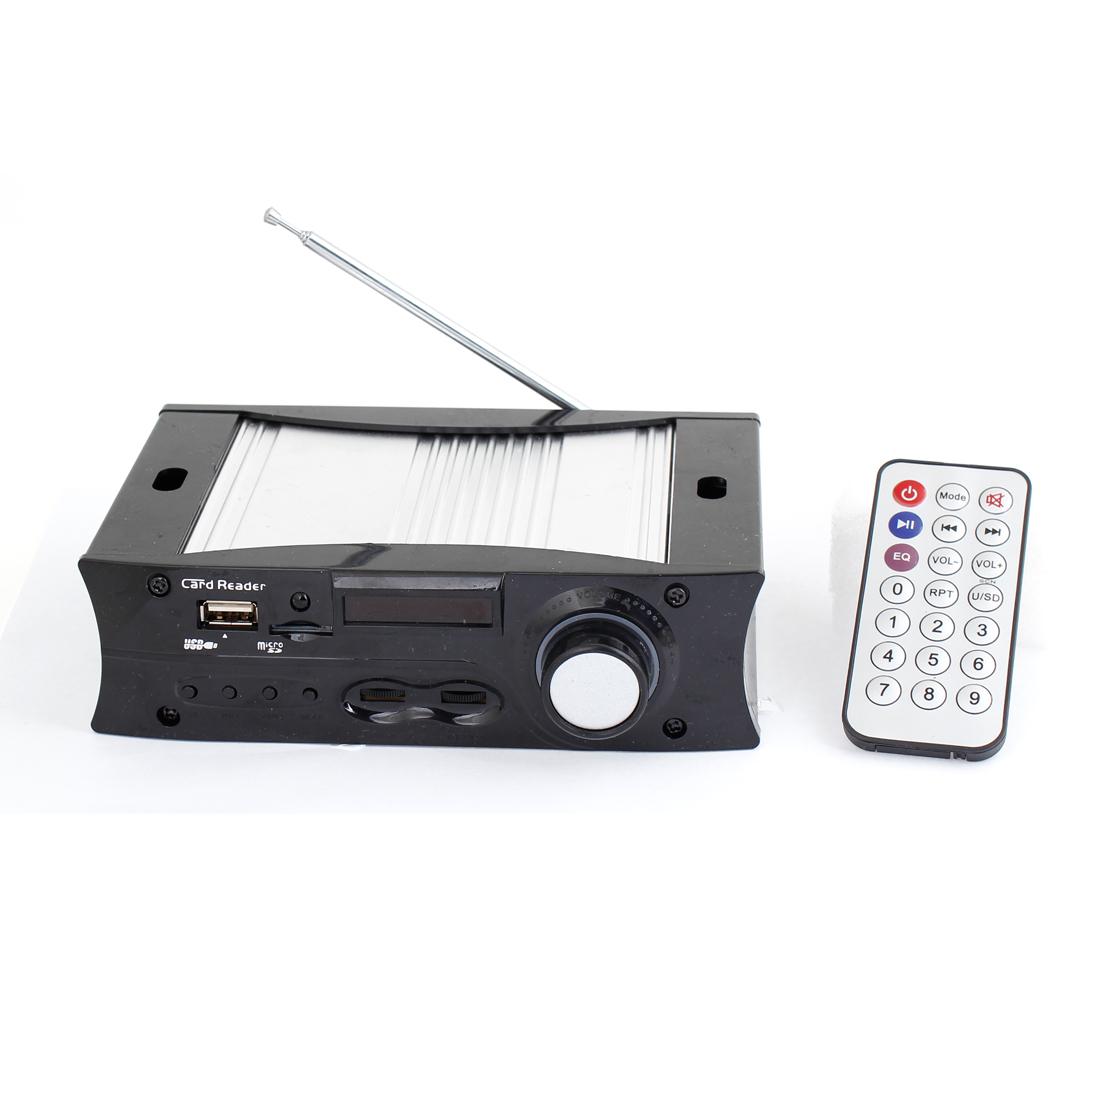 Black 25W DC 12-15V Car Audio MP3 Stereo Hifi Amplifier + USB Port + Remote